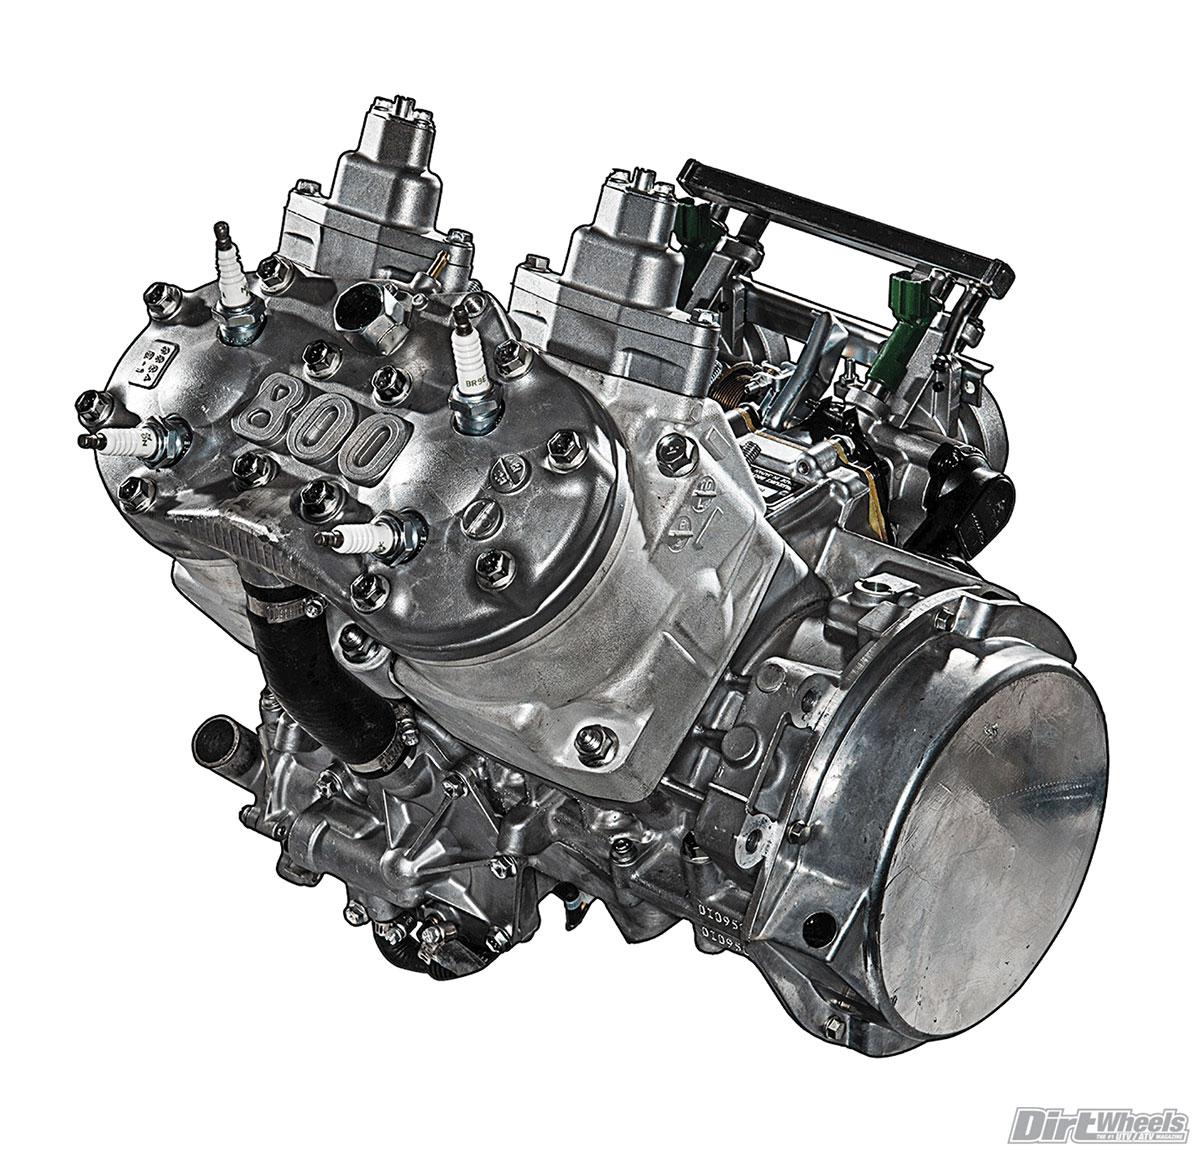 hight resolution of 2005 mercede c230 engine